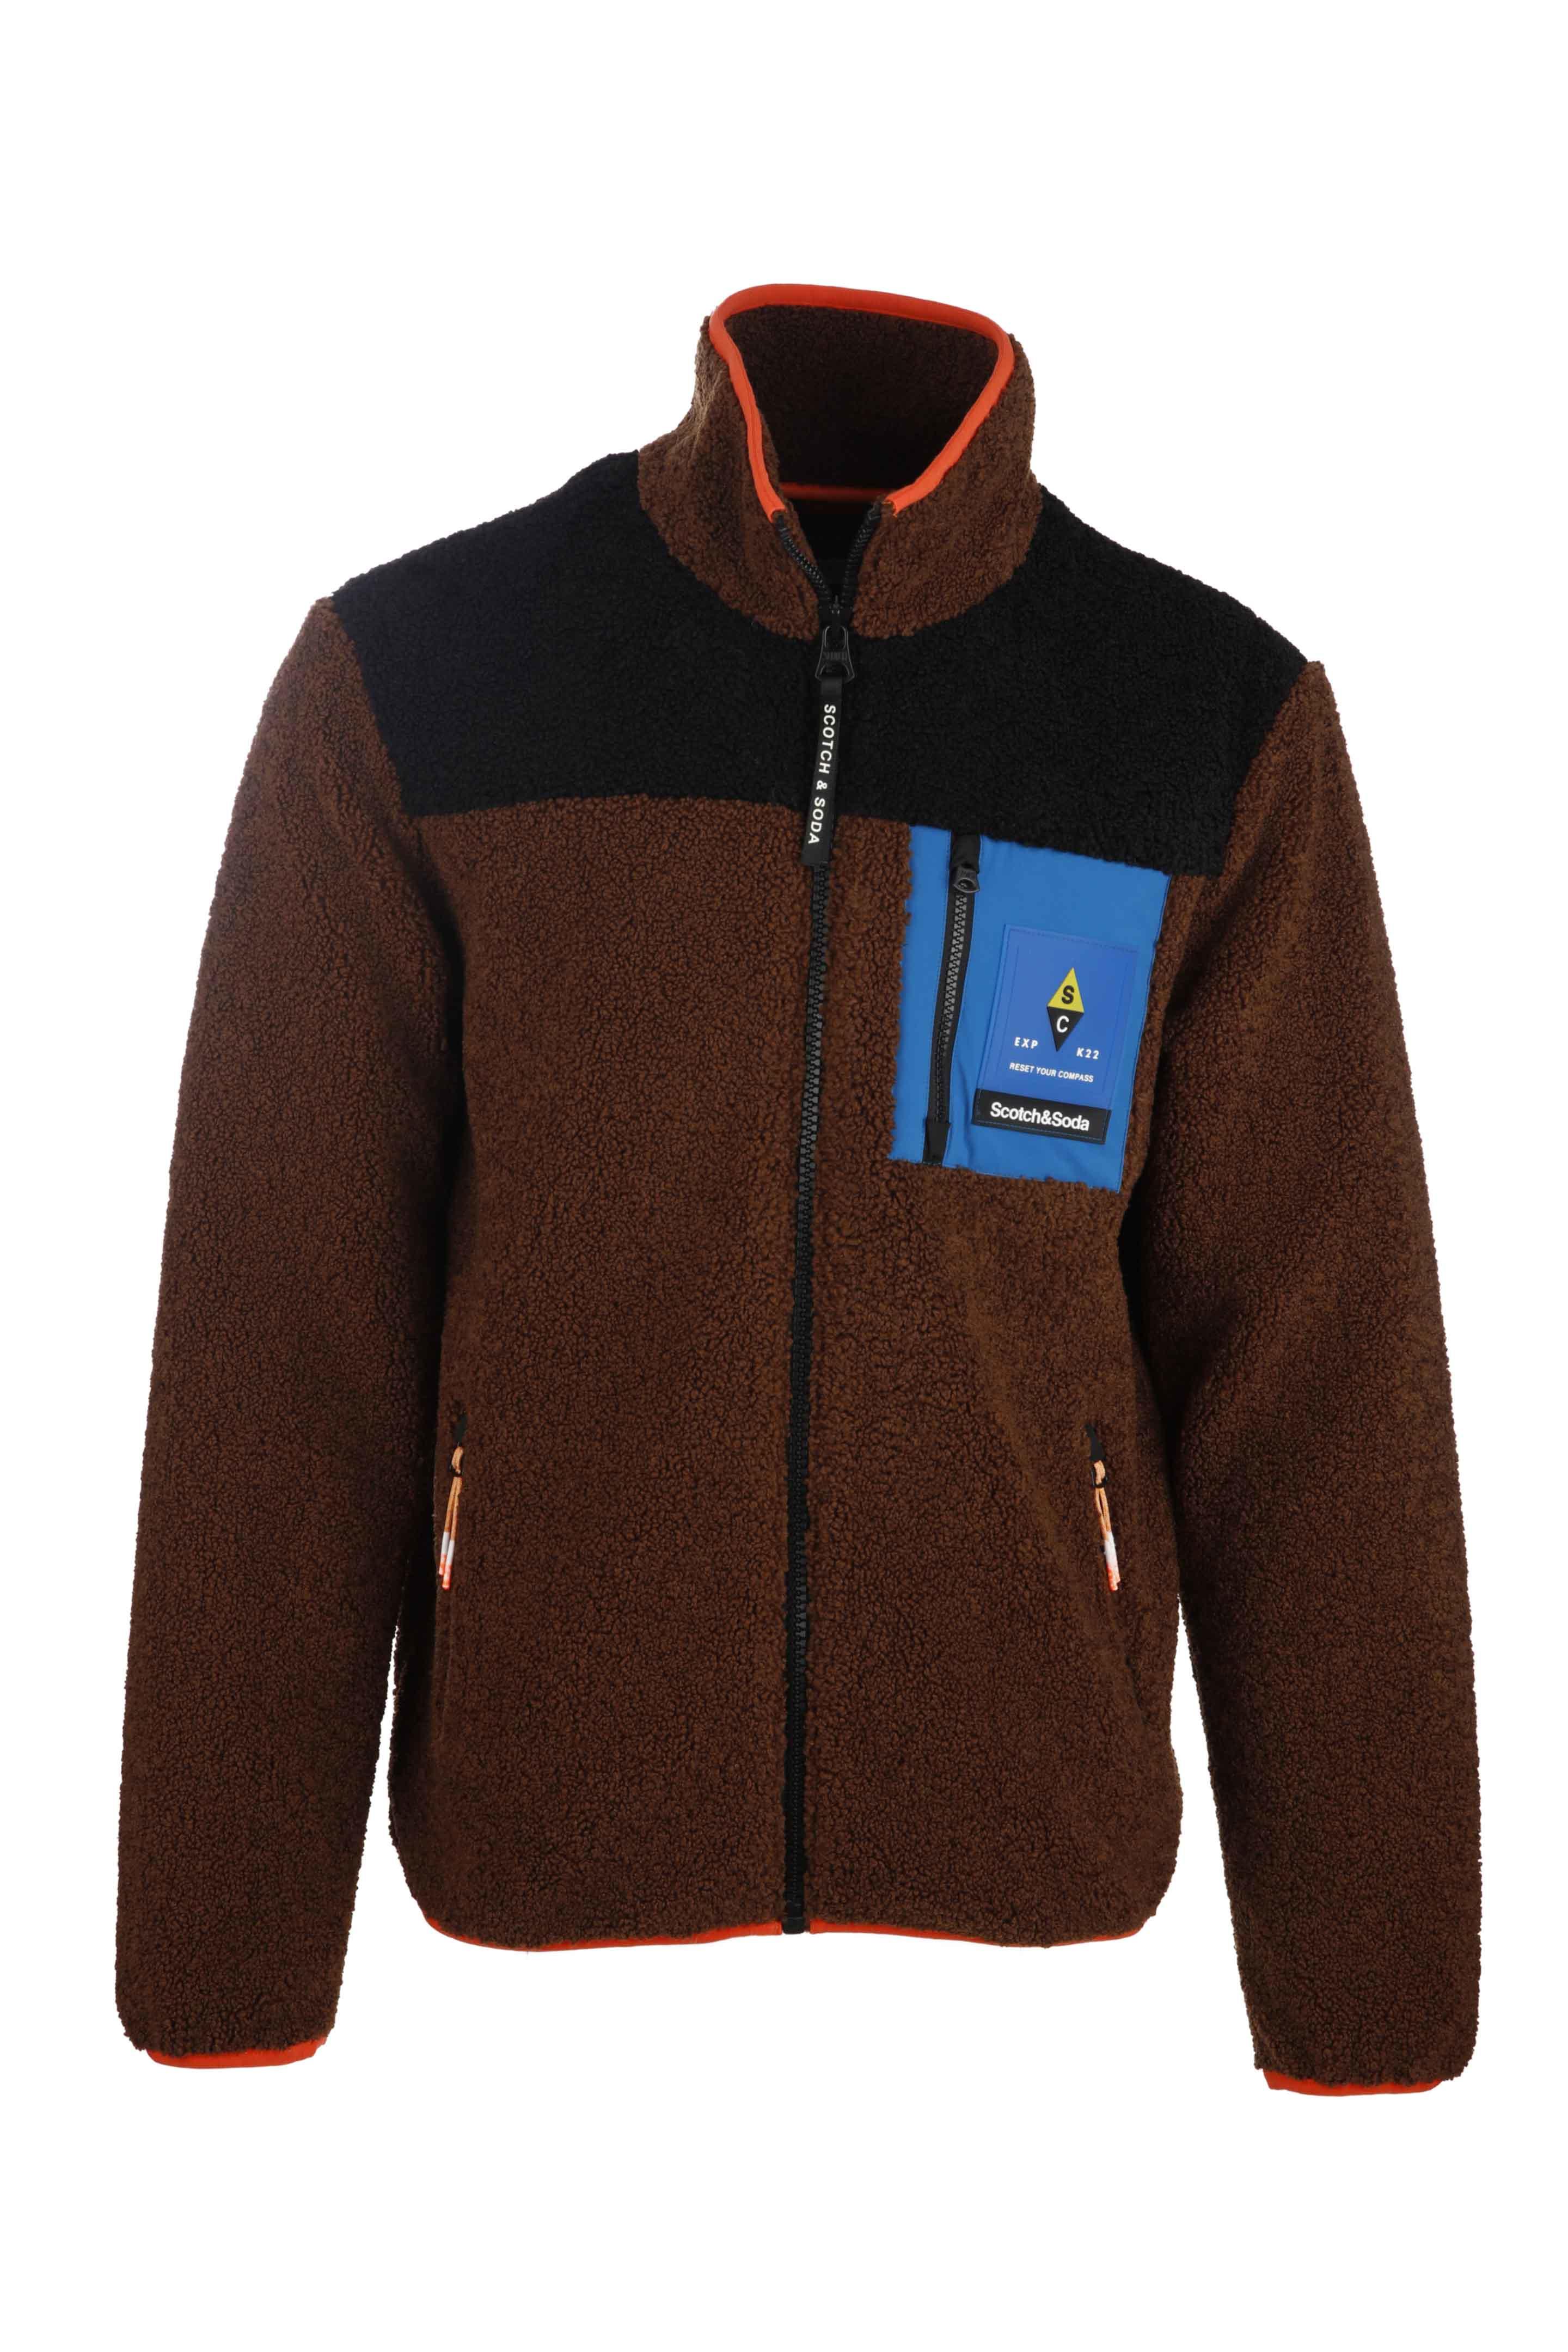 Colourblock Jacket